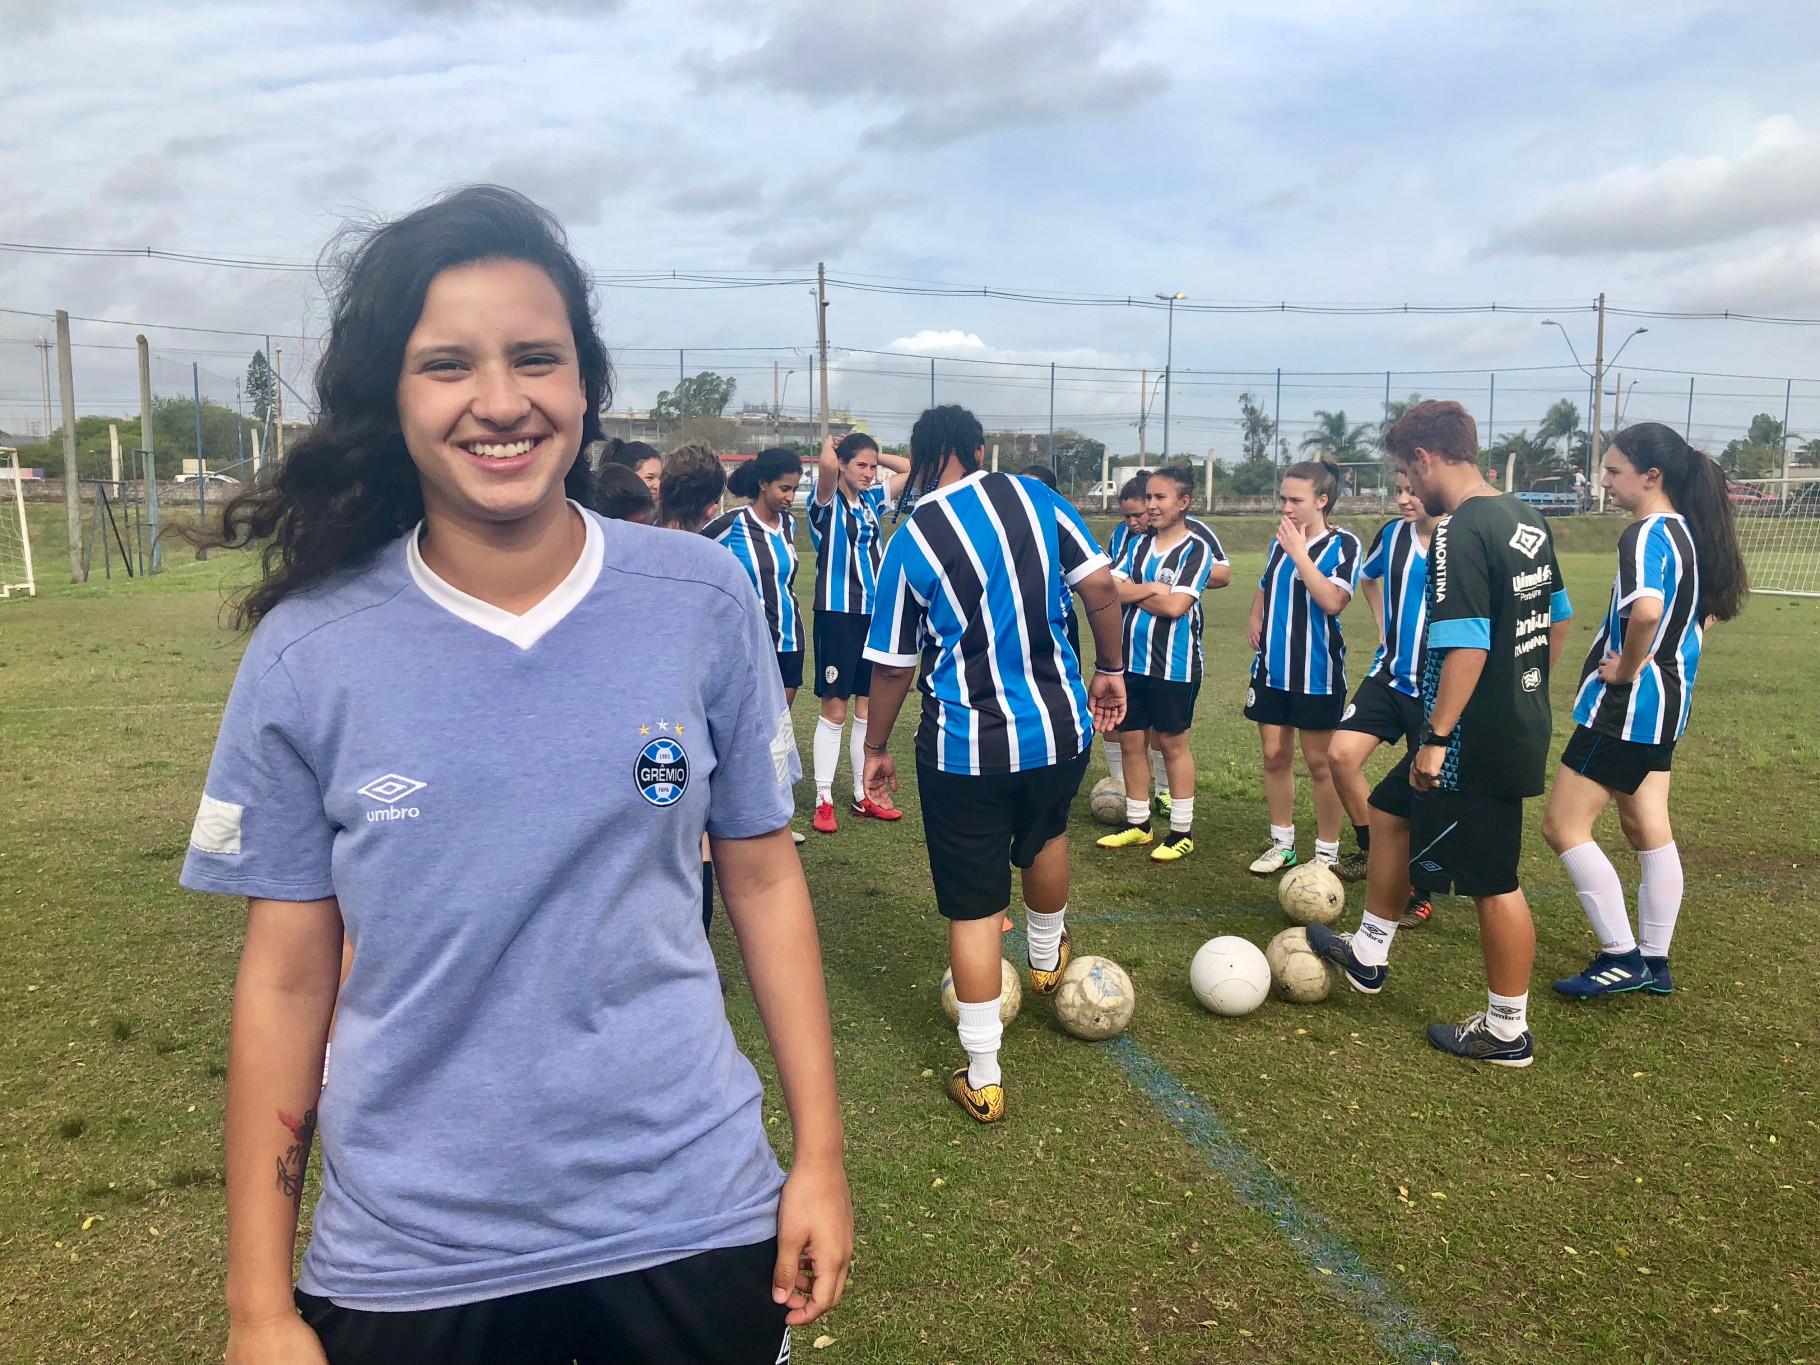 Atleta da Escola de Futebol ingressa na equipe profissional feminina do  Grêmio 0c633072667c5